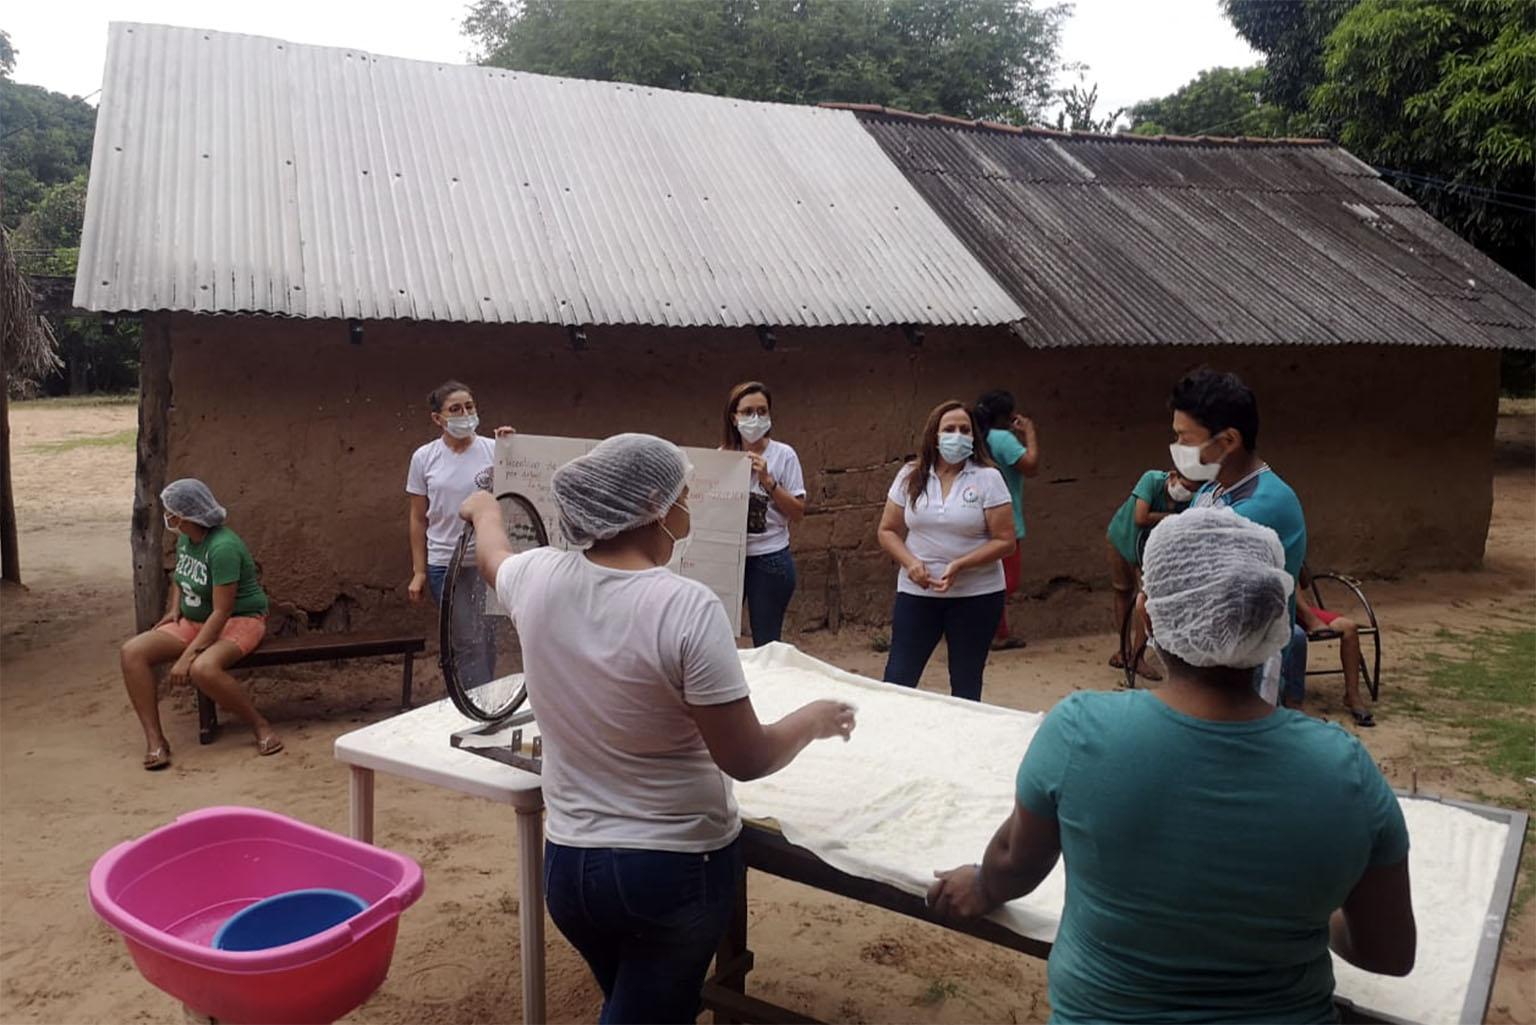 Sowing Hope project in Yororoba, Bolivia. Photo credit: El Llamado del Bosque